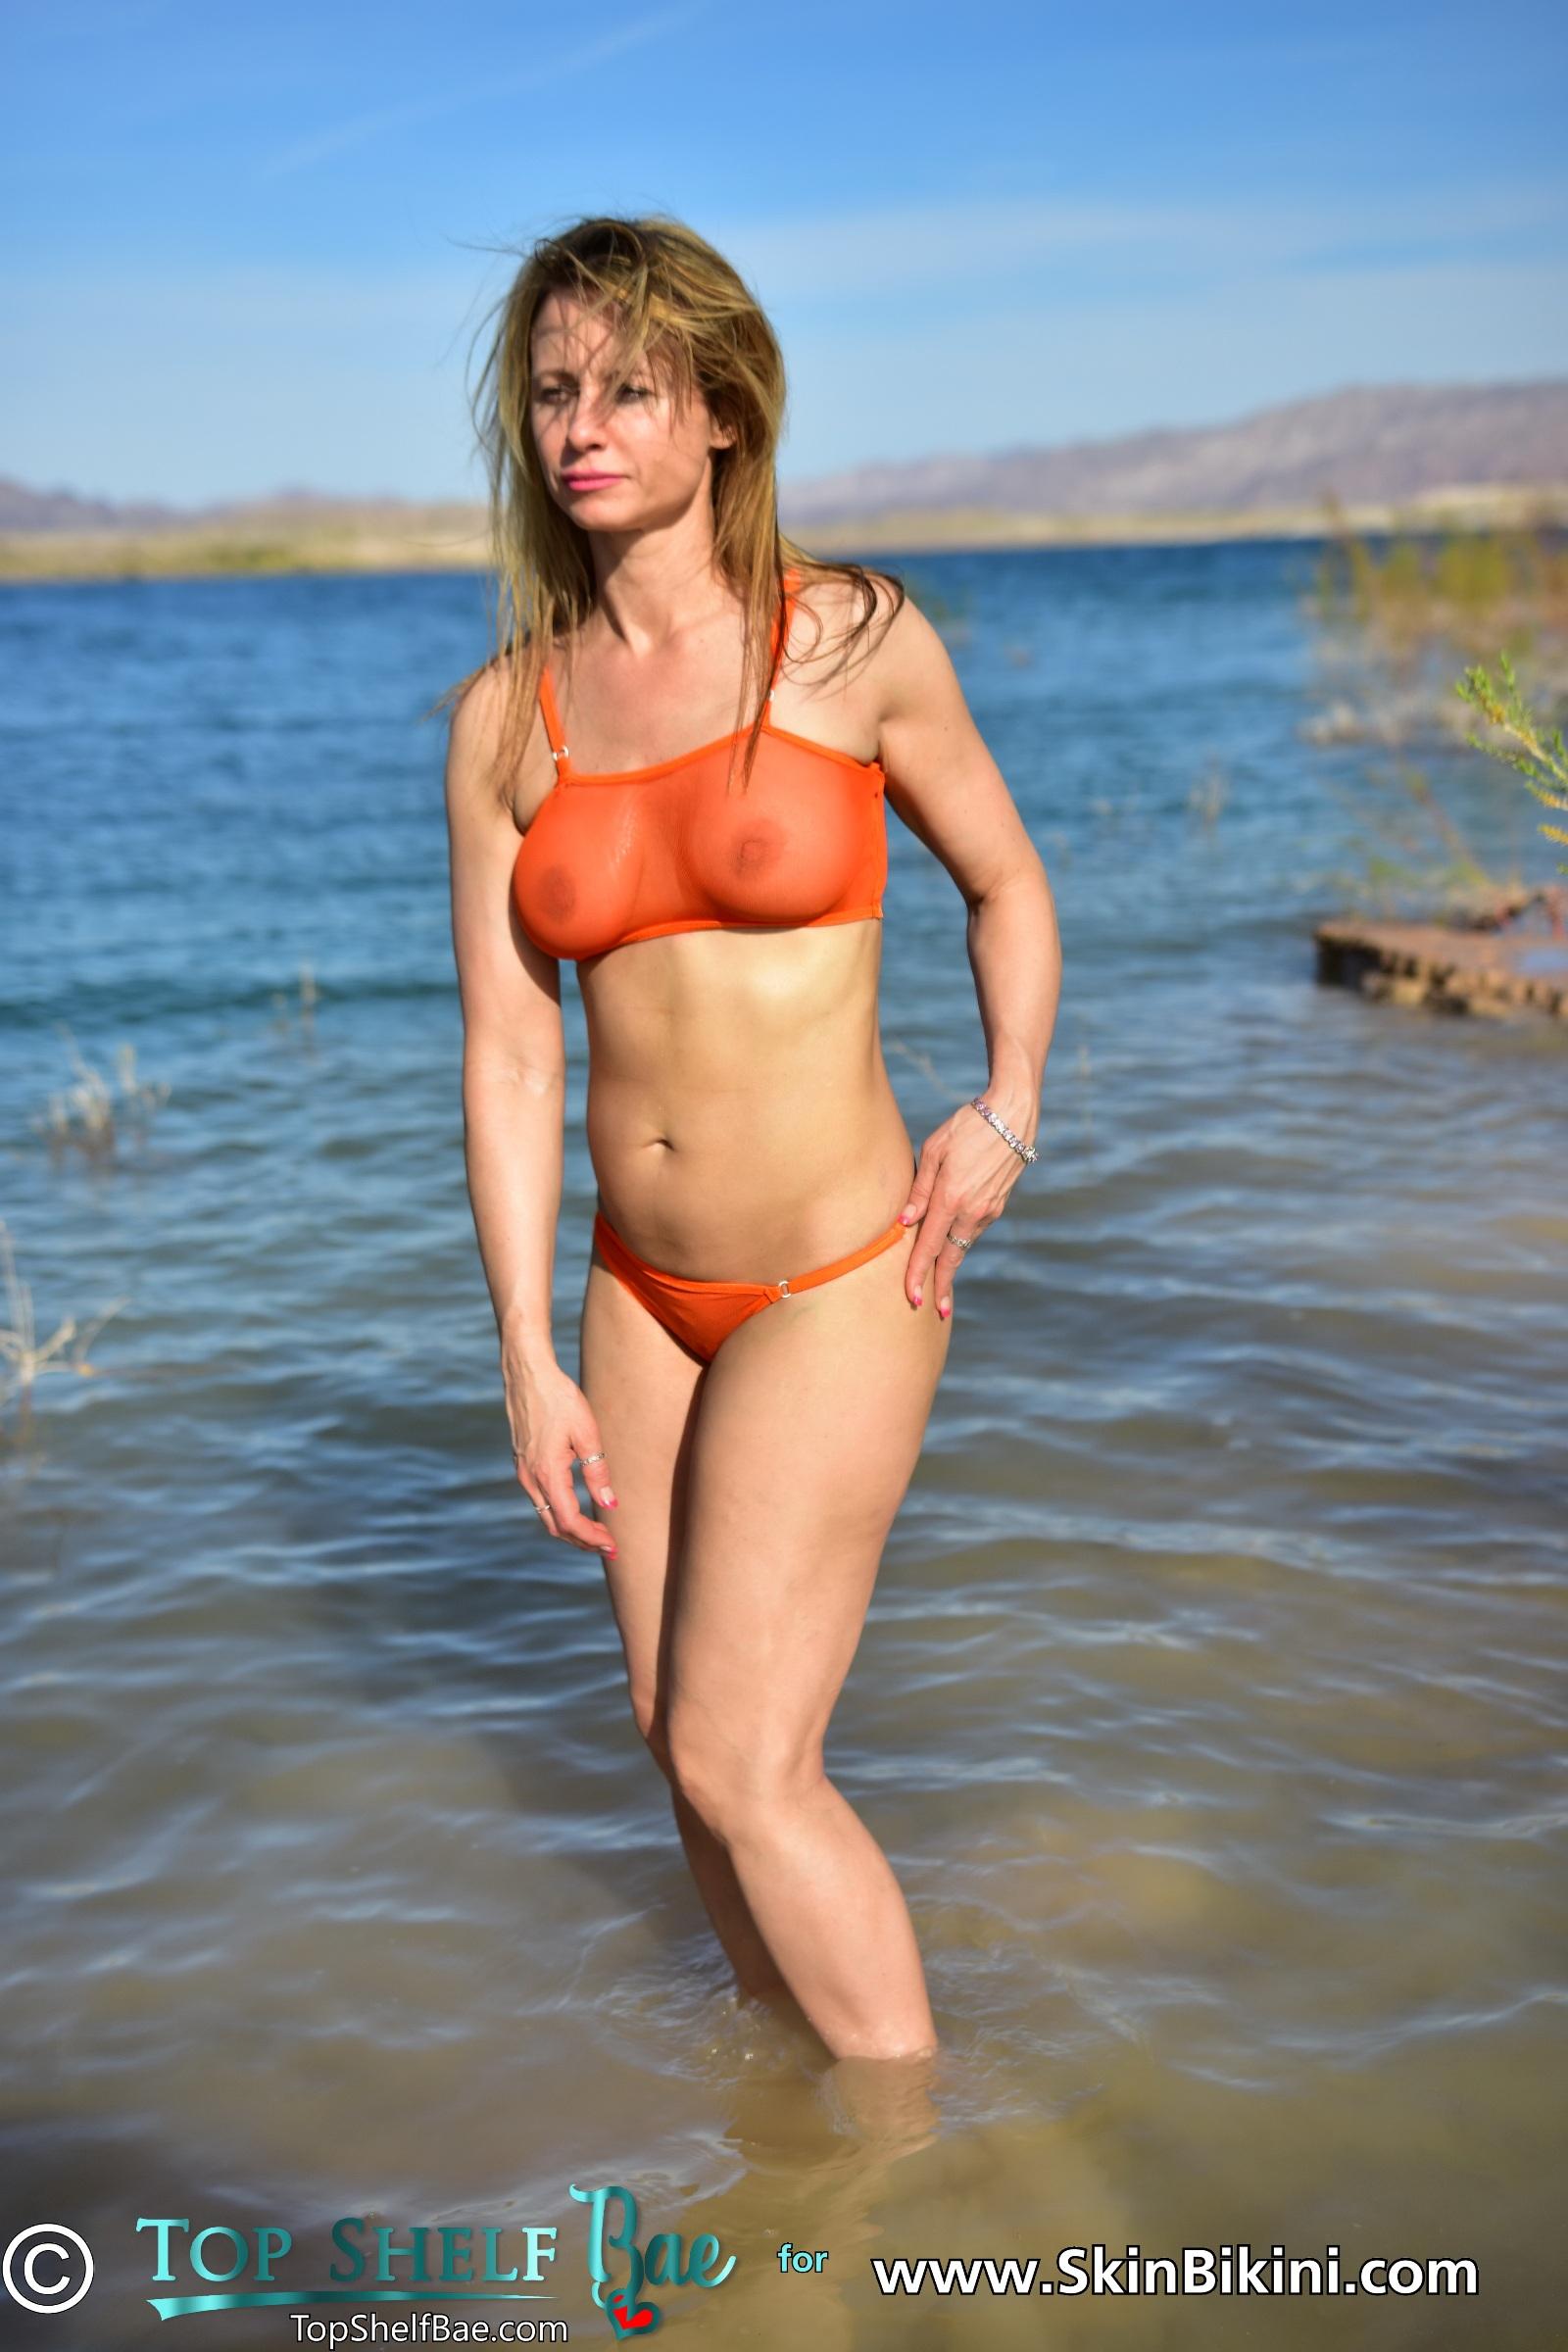 Sexy USA model from Topshelfbae is wearing daring see-thru tankini set from SkinBikini.com